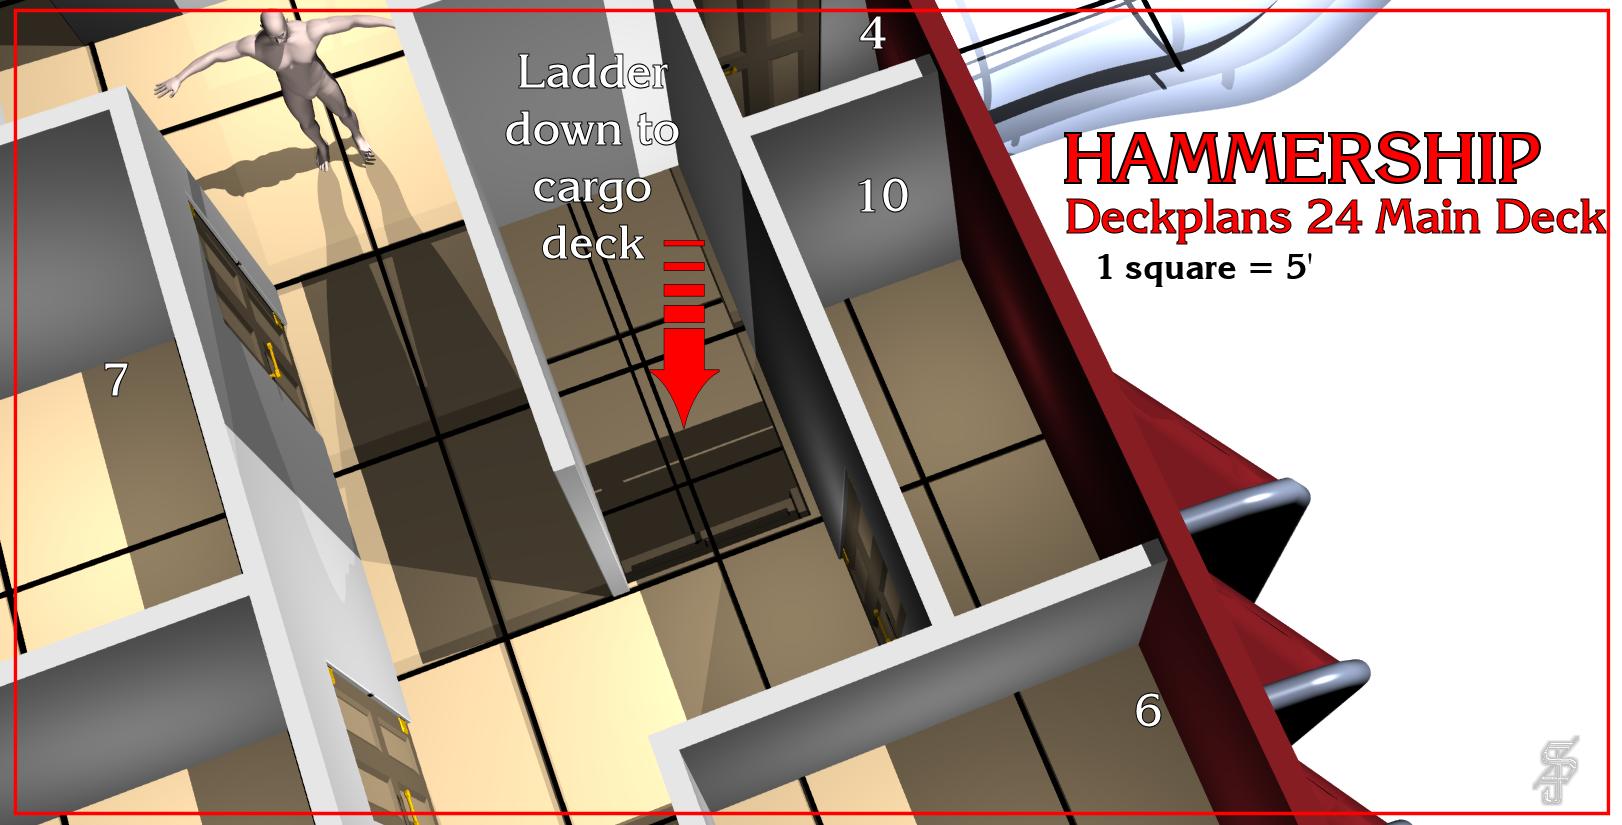 Hammership layout 24